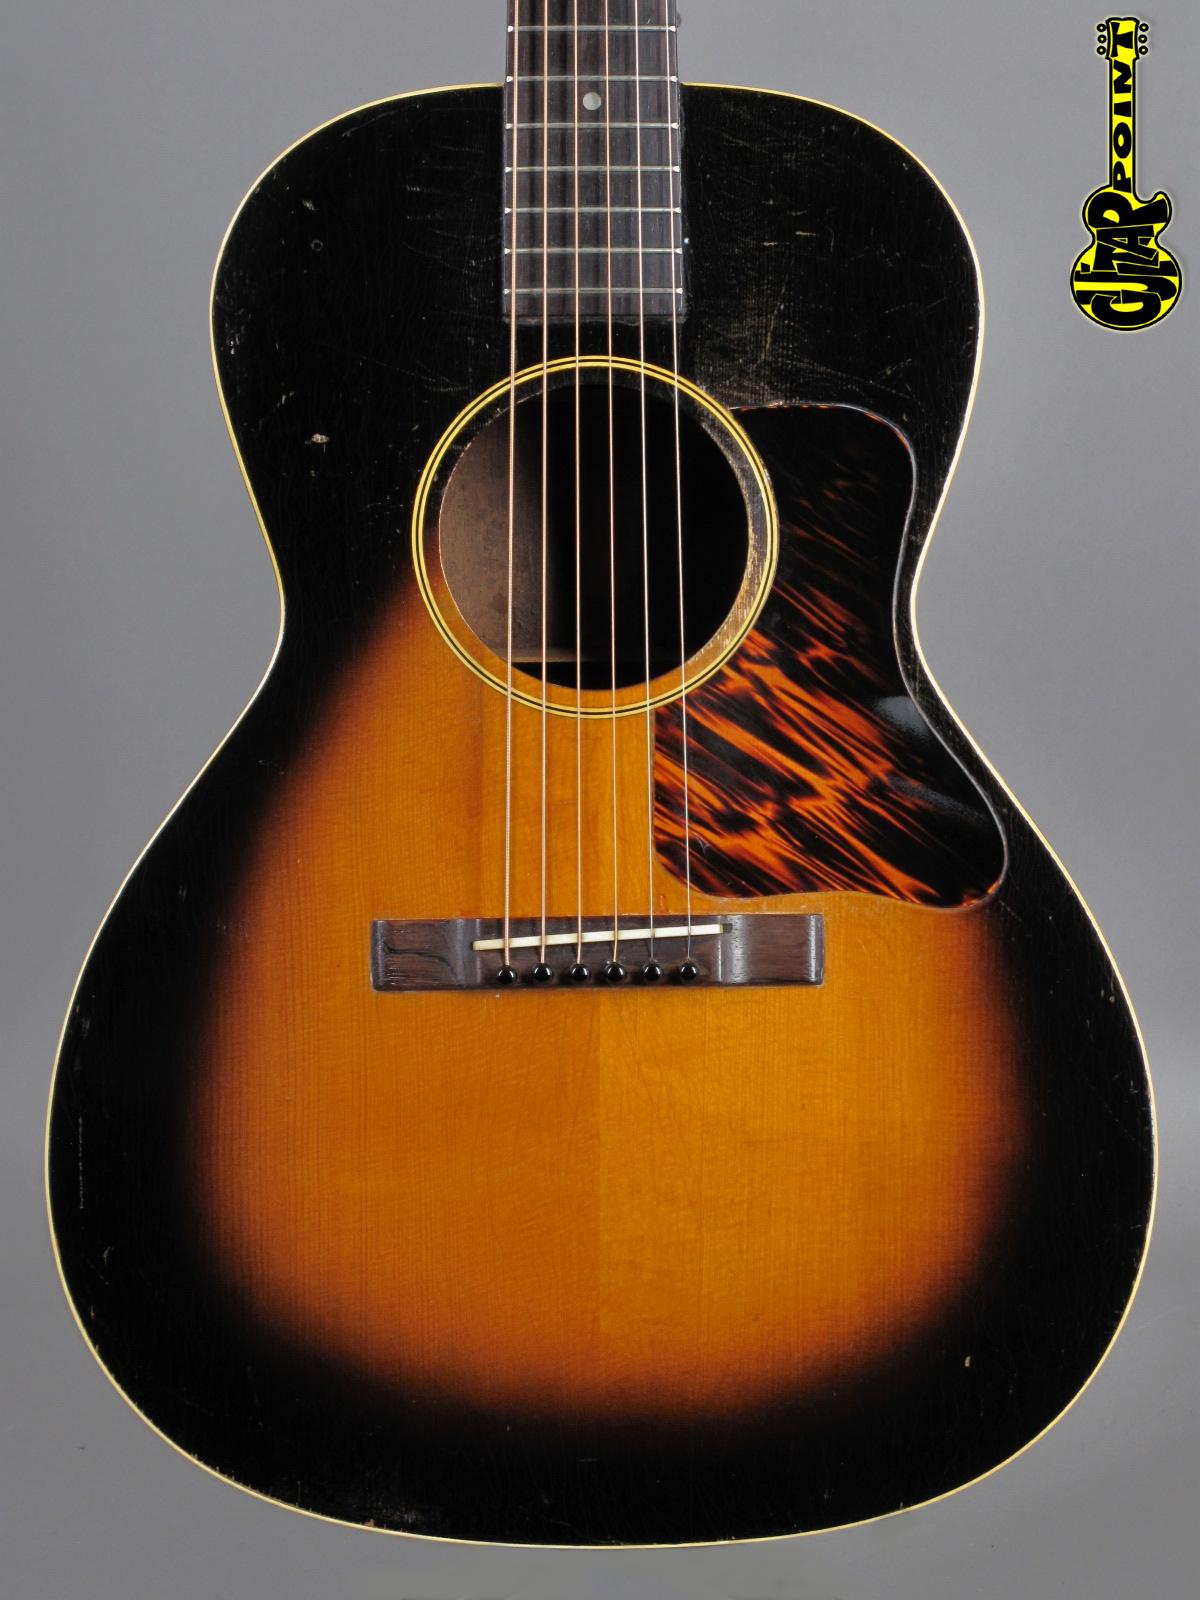 1935 Gibson L-00 Sunburst